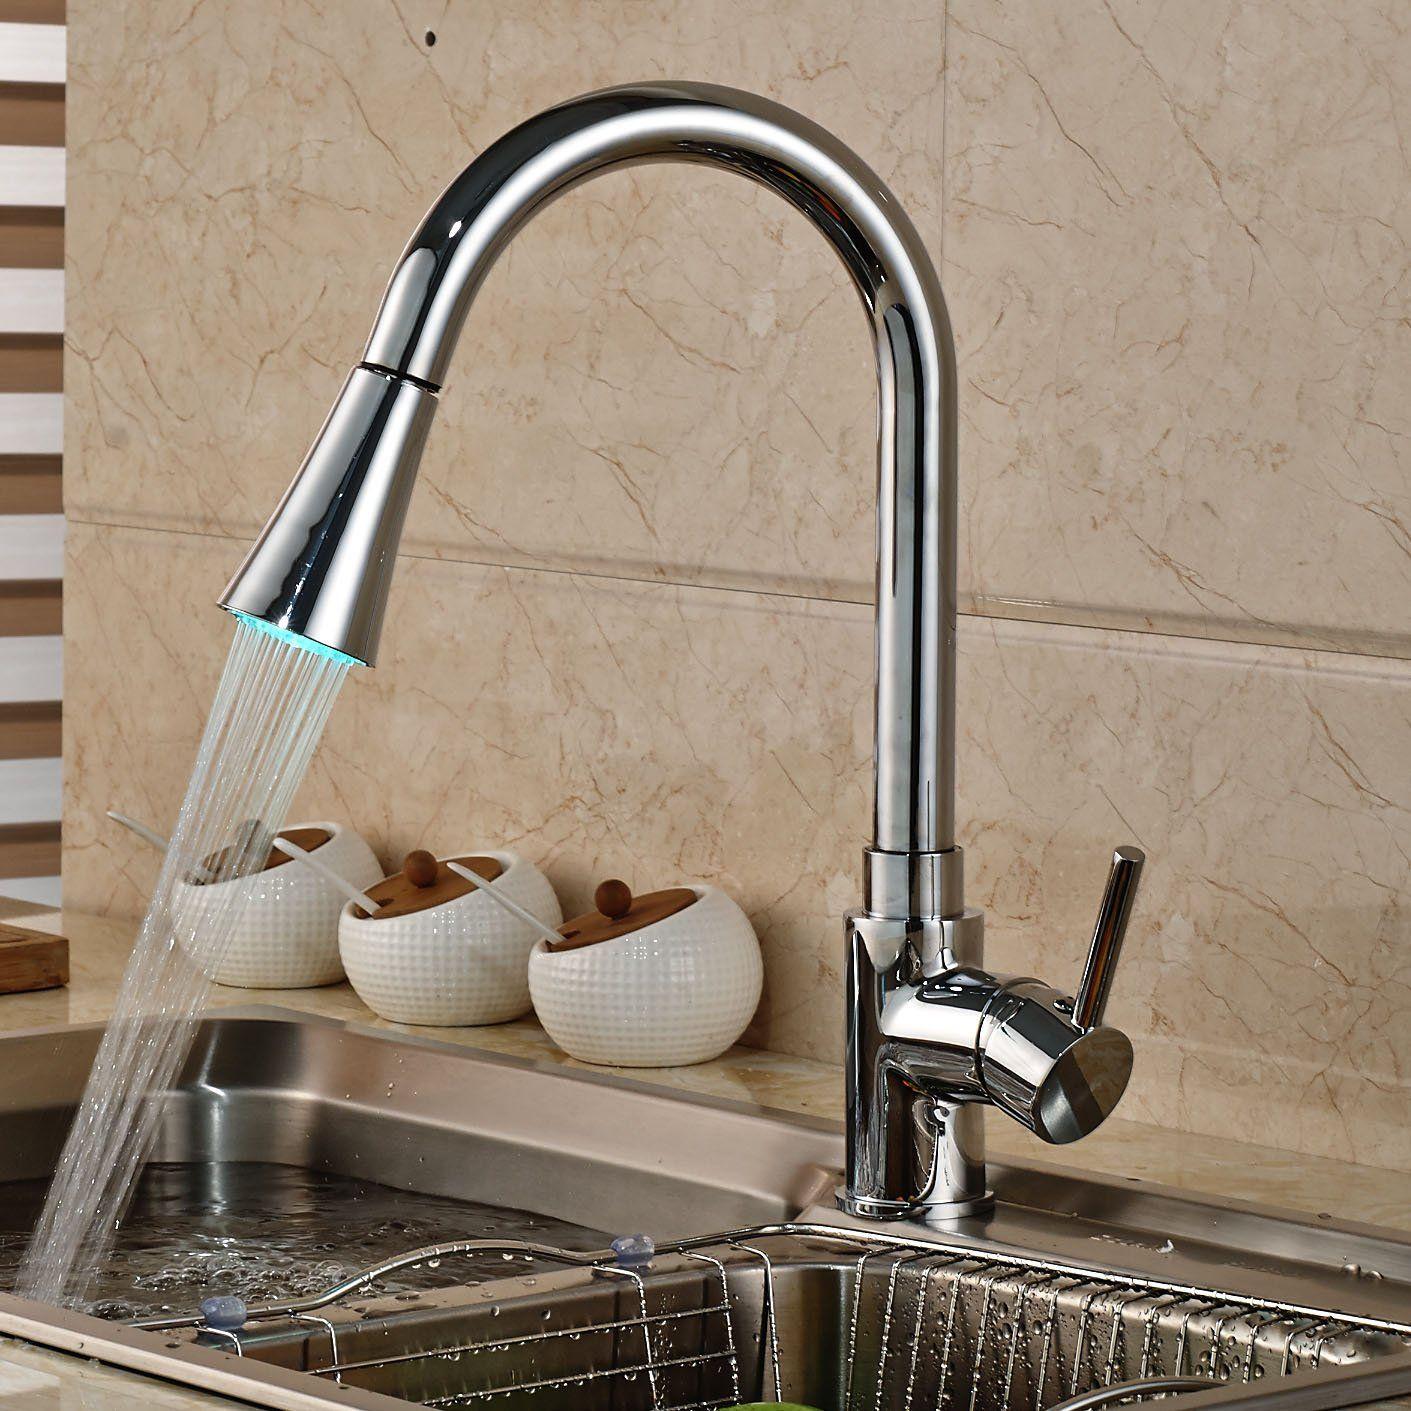 Rozin Chrome Swivel Spout Kitchen Faucet LED Light Pull Out Spray